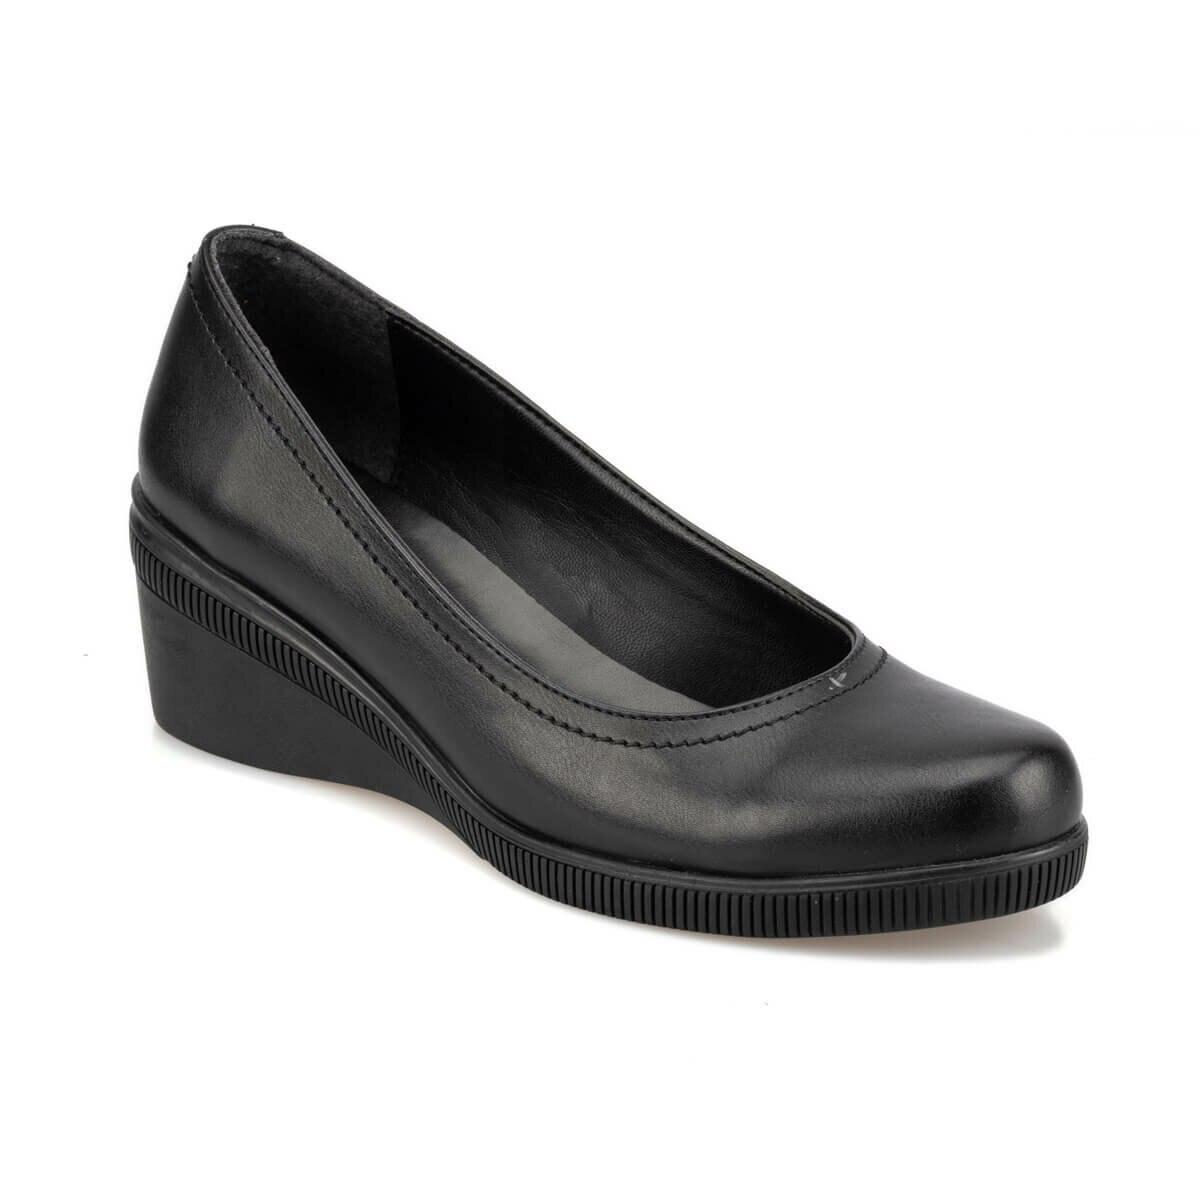 FLO 92.314095.Z Black Women Gova Shoes Polaris